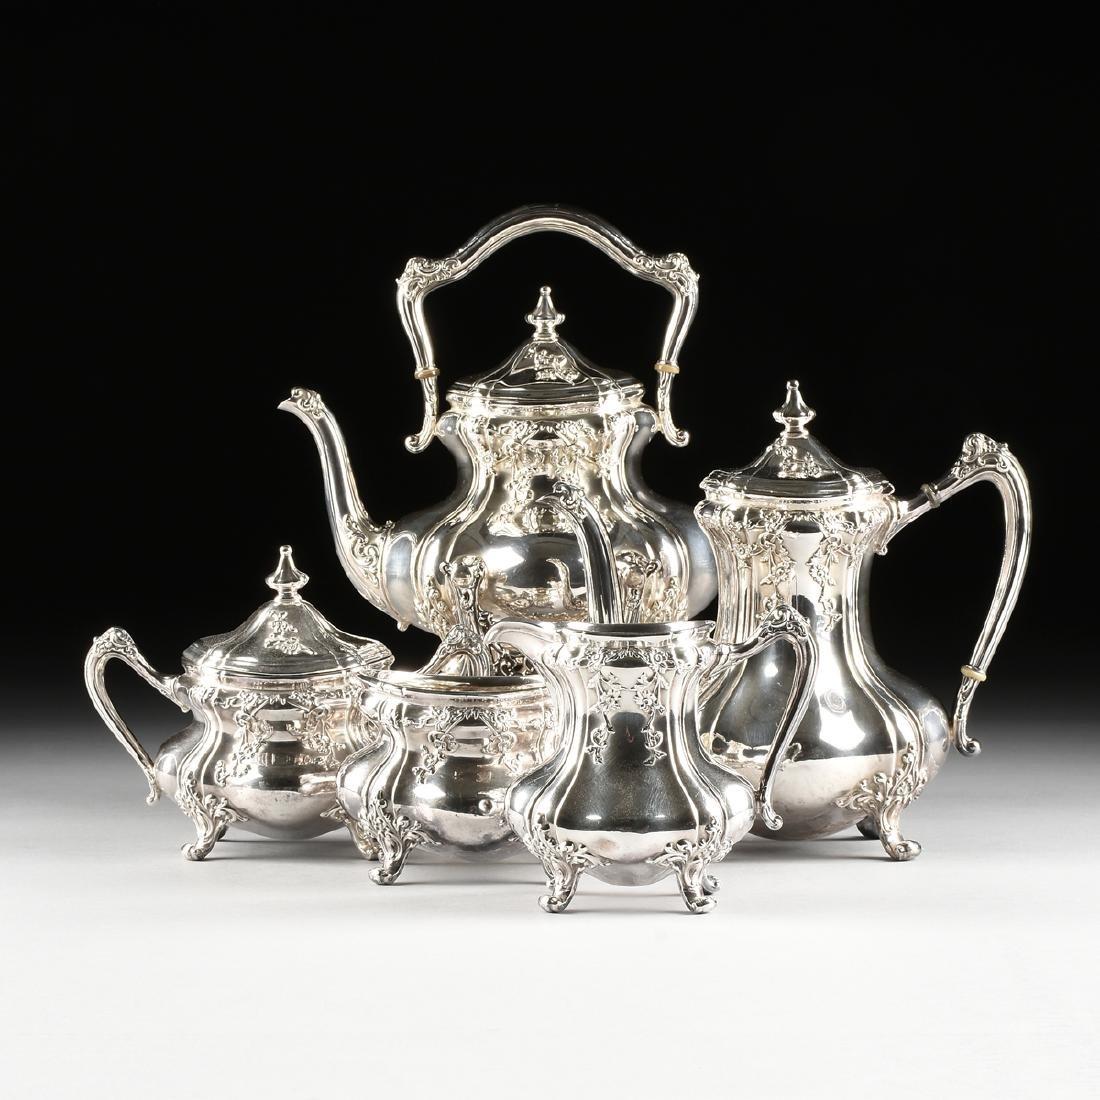 A FIVE PIECE REED & BARTON SILVER PLATED TEA SERVICE,